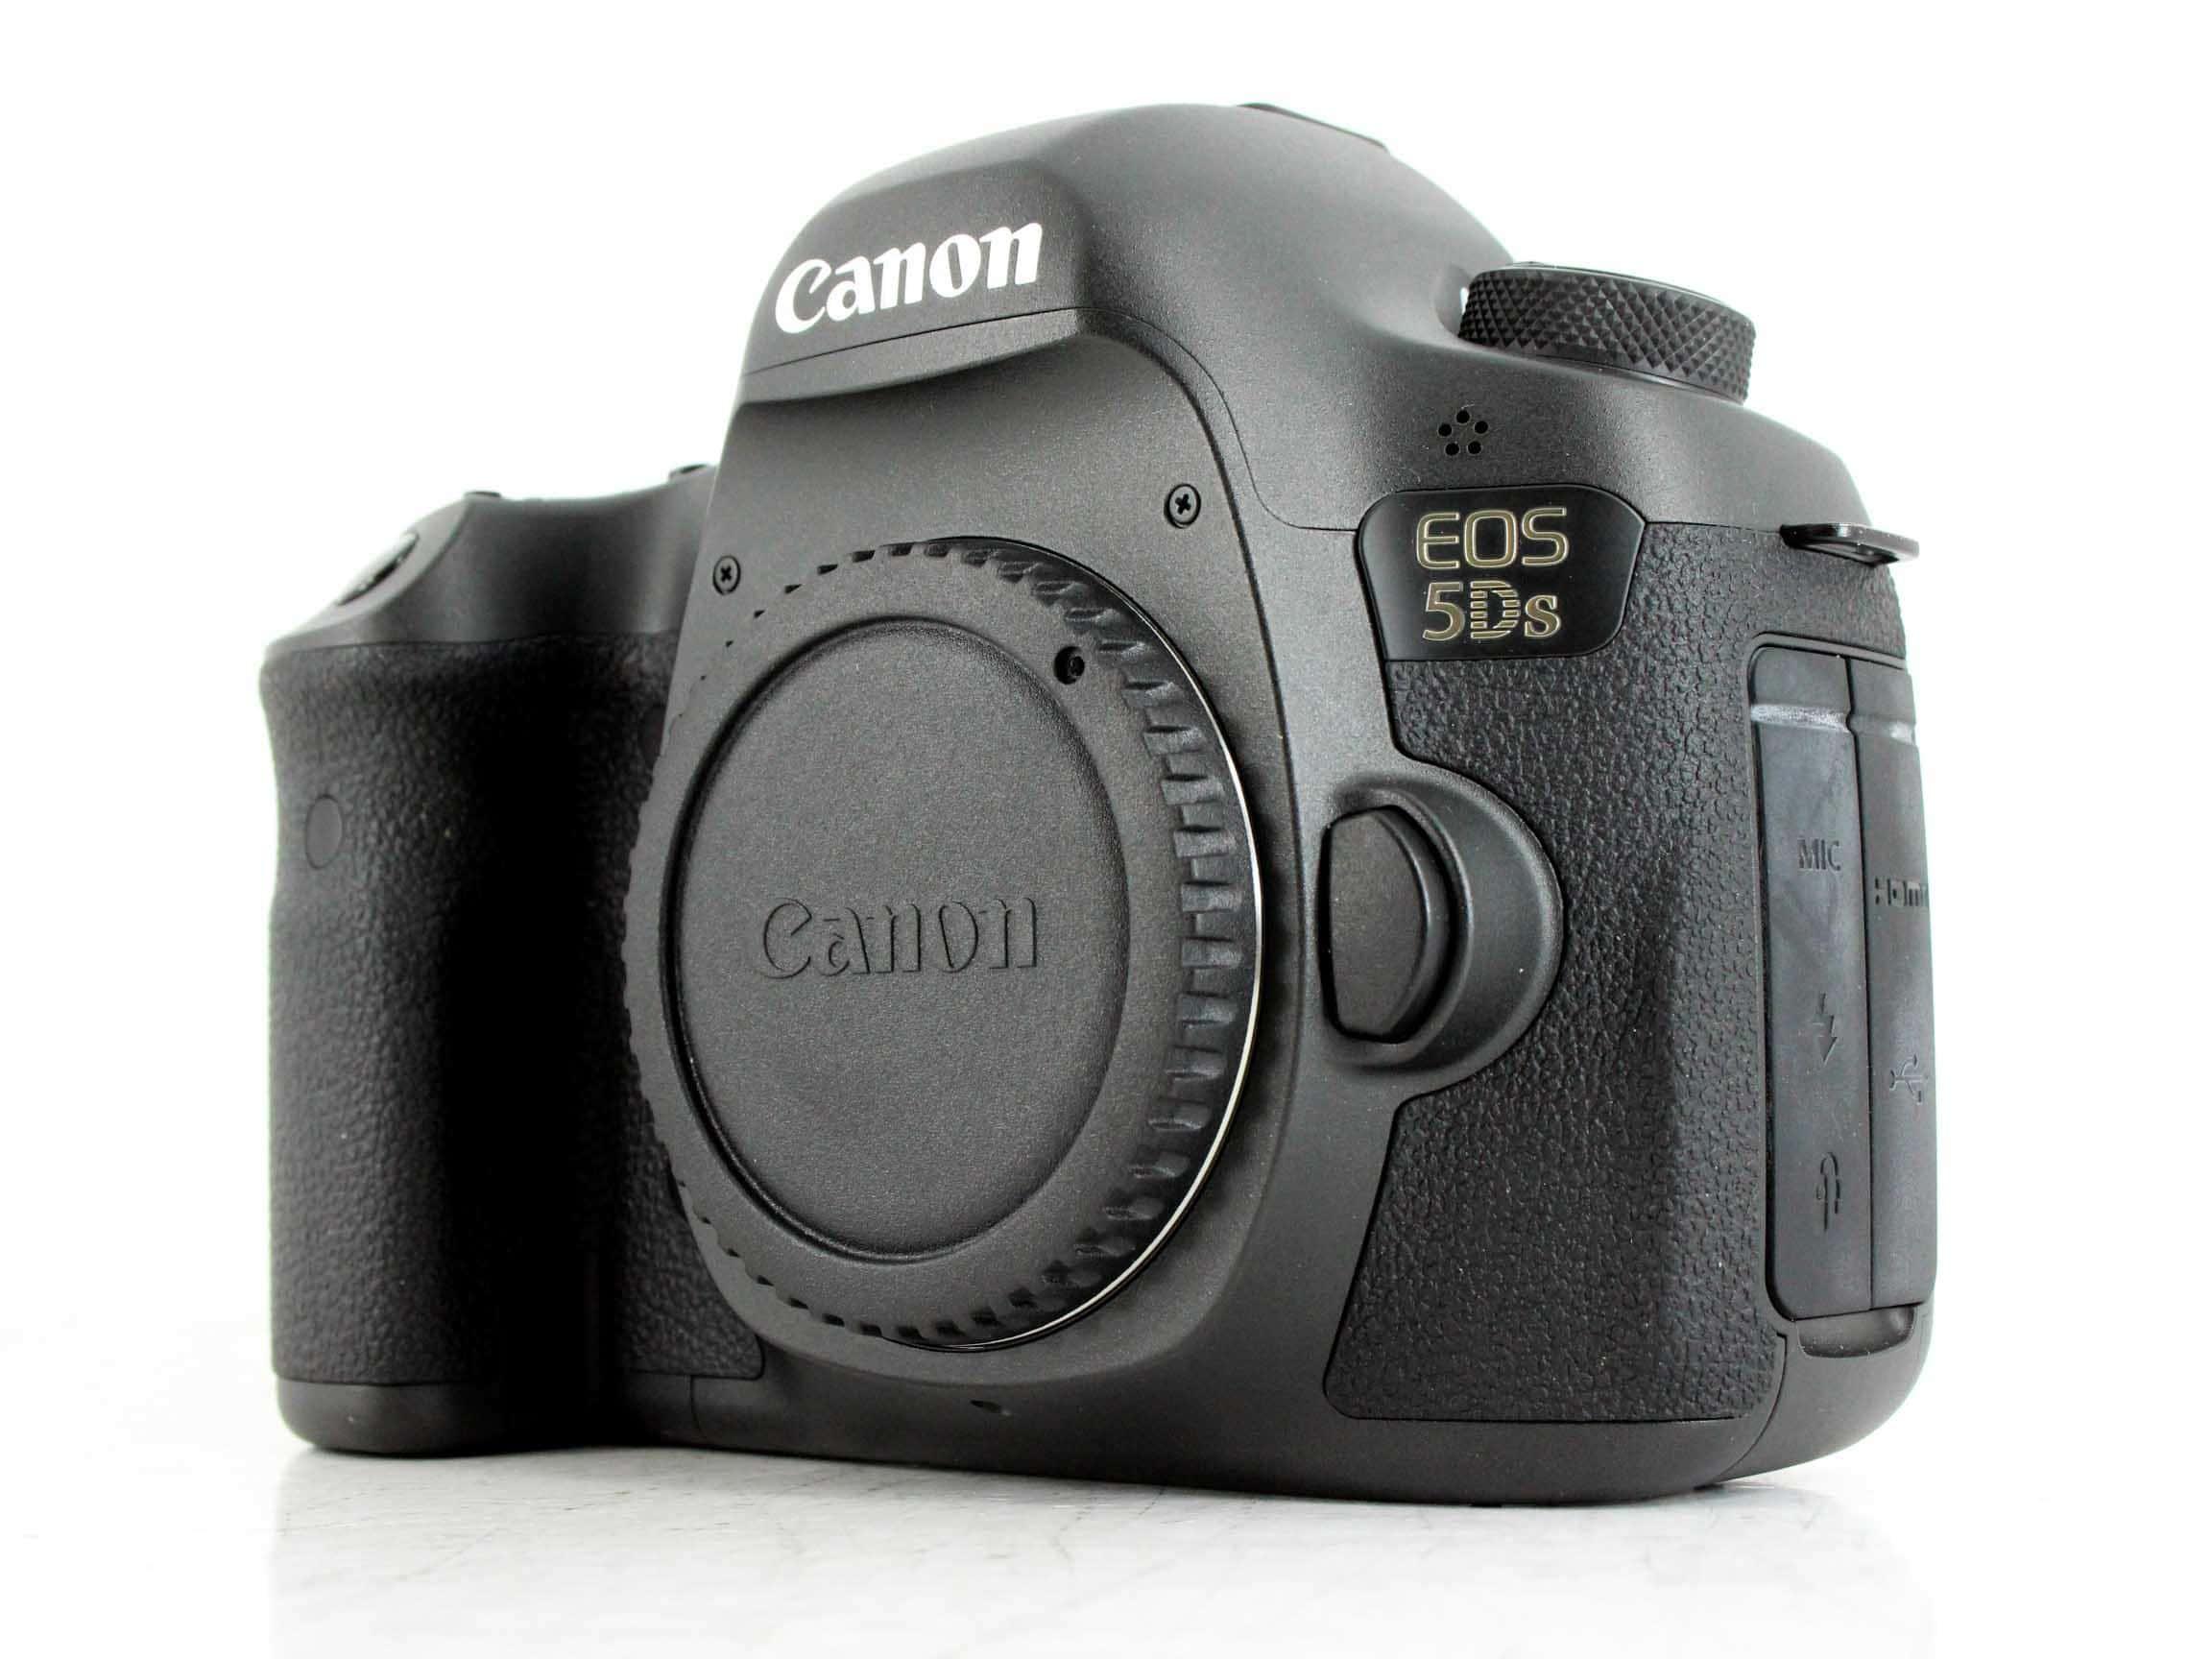 canon5ds min image